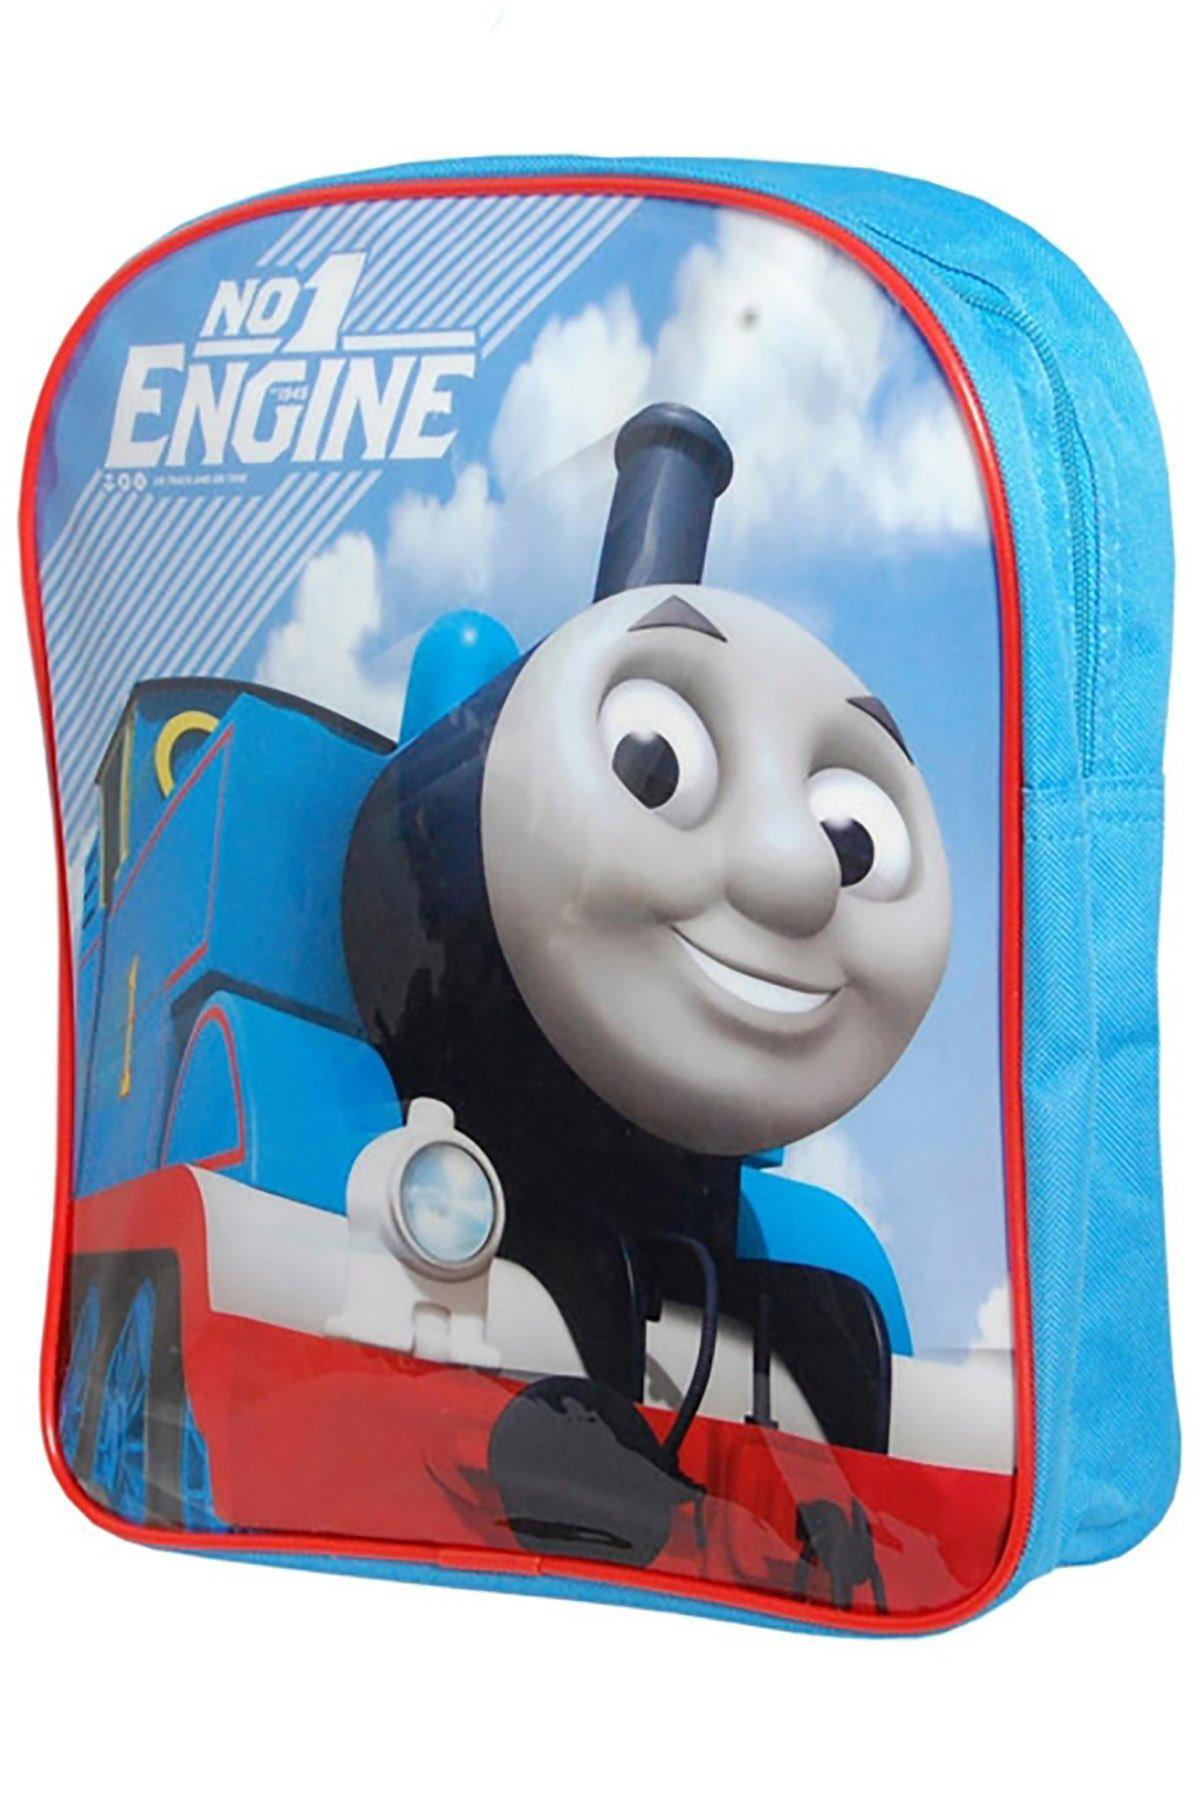 Personalised Backpack//Rucksack//School Bag Thomas Tank Style Design Pink//Blue//Red